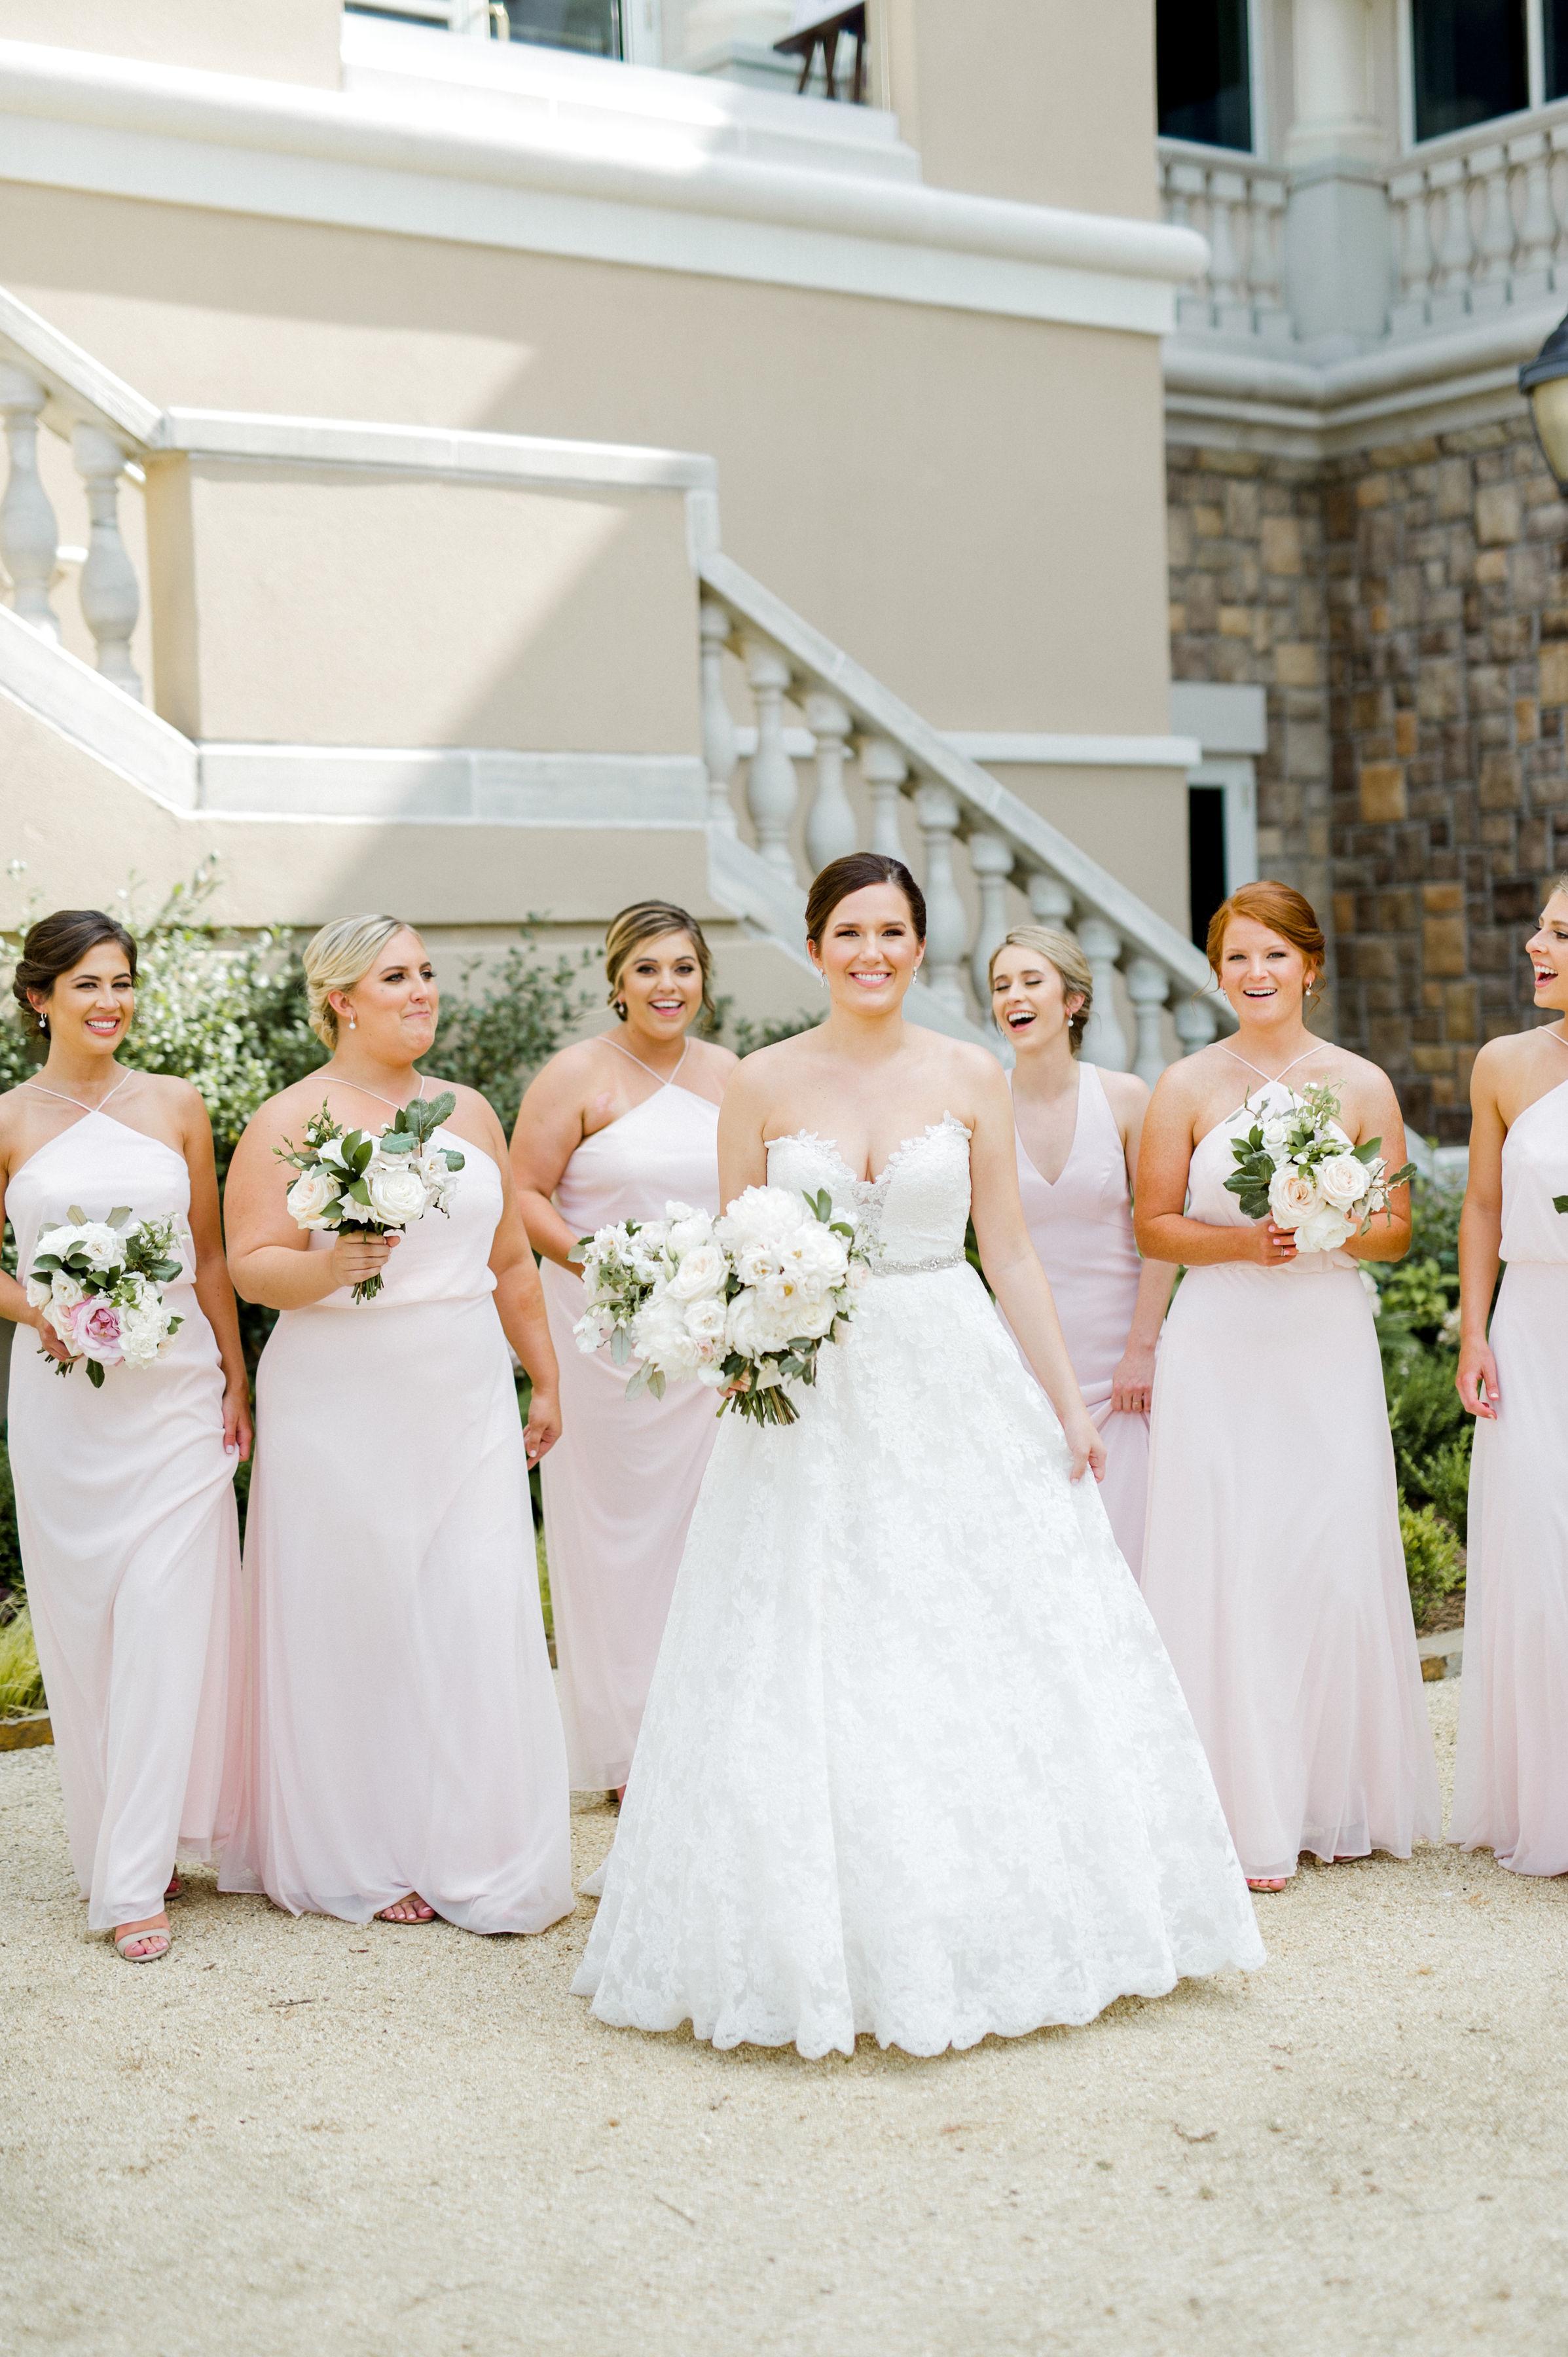 McElravey_Wedding_CarolineLimaPhotography_2018_177.jpg